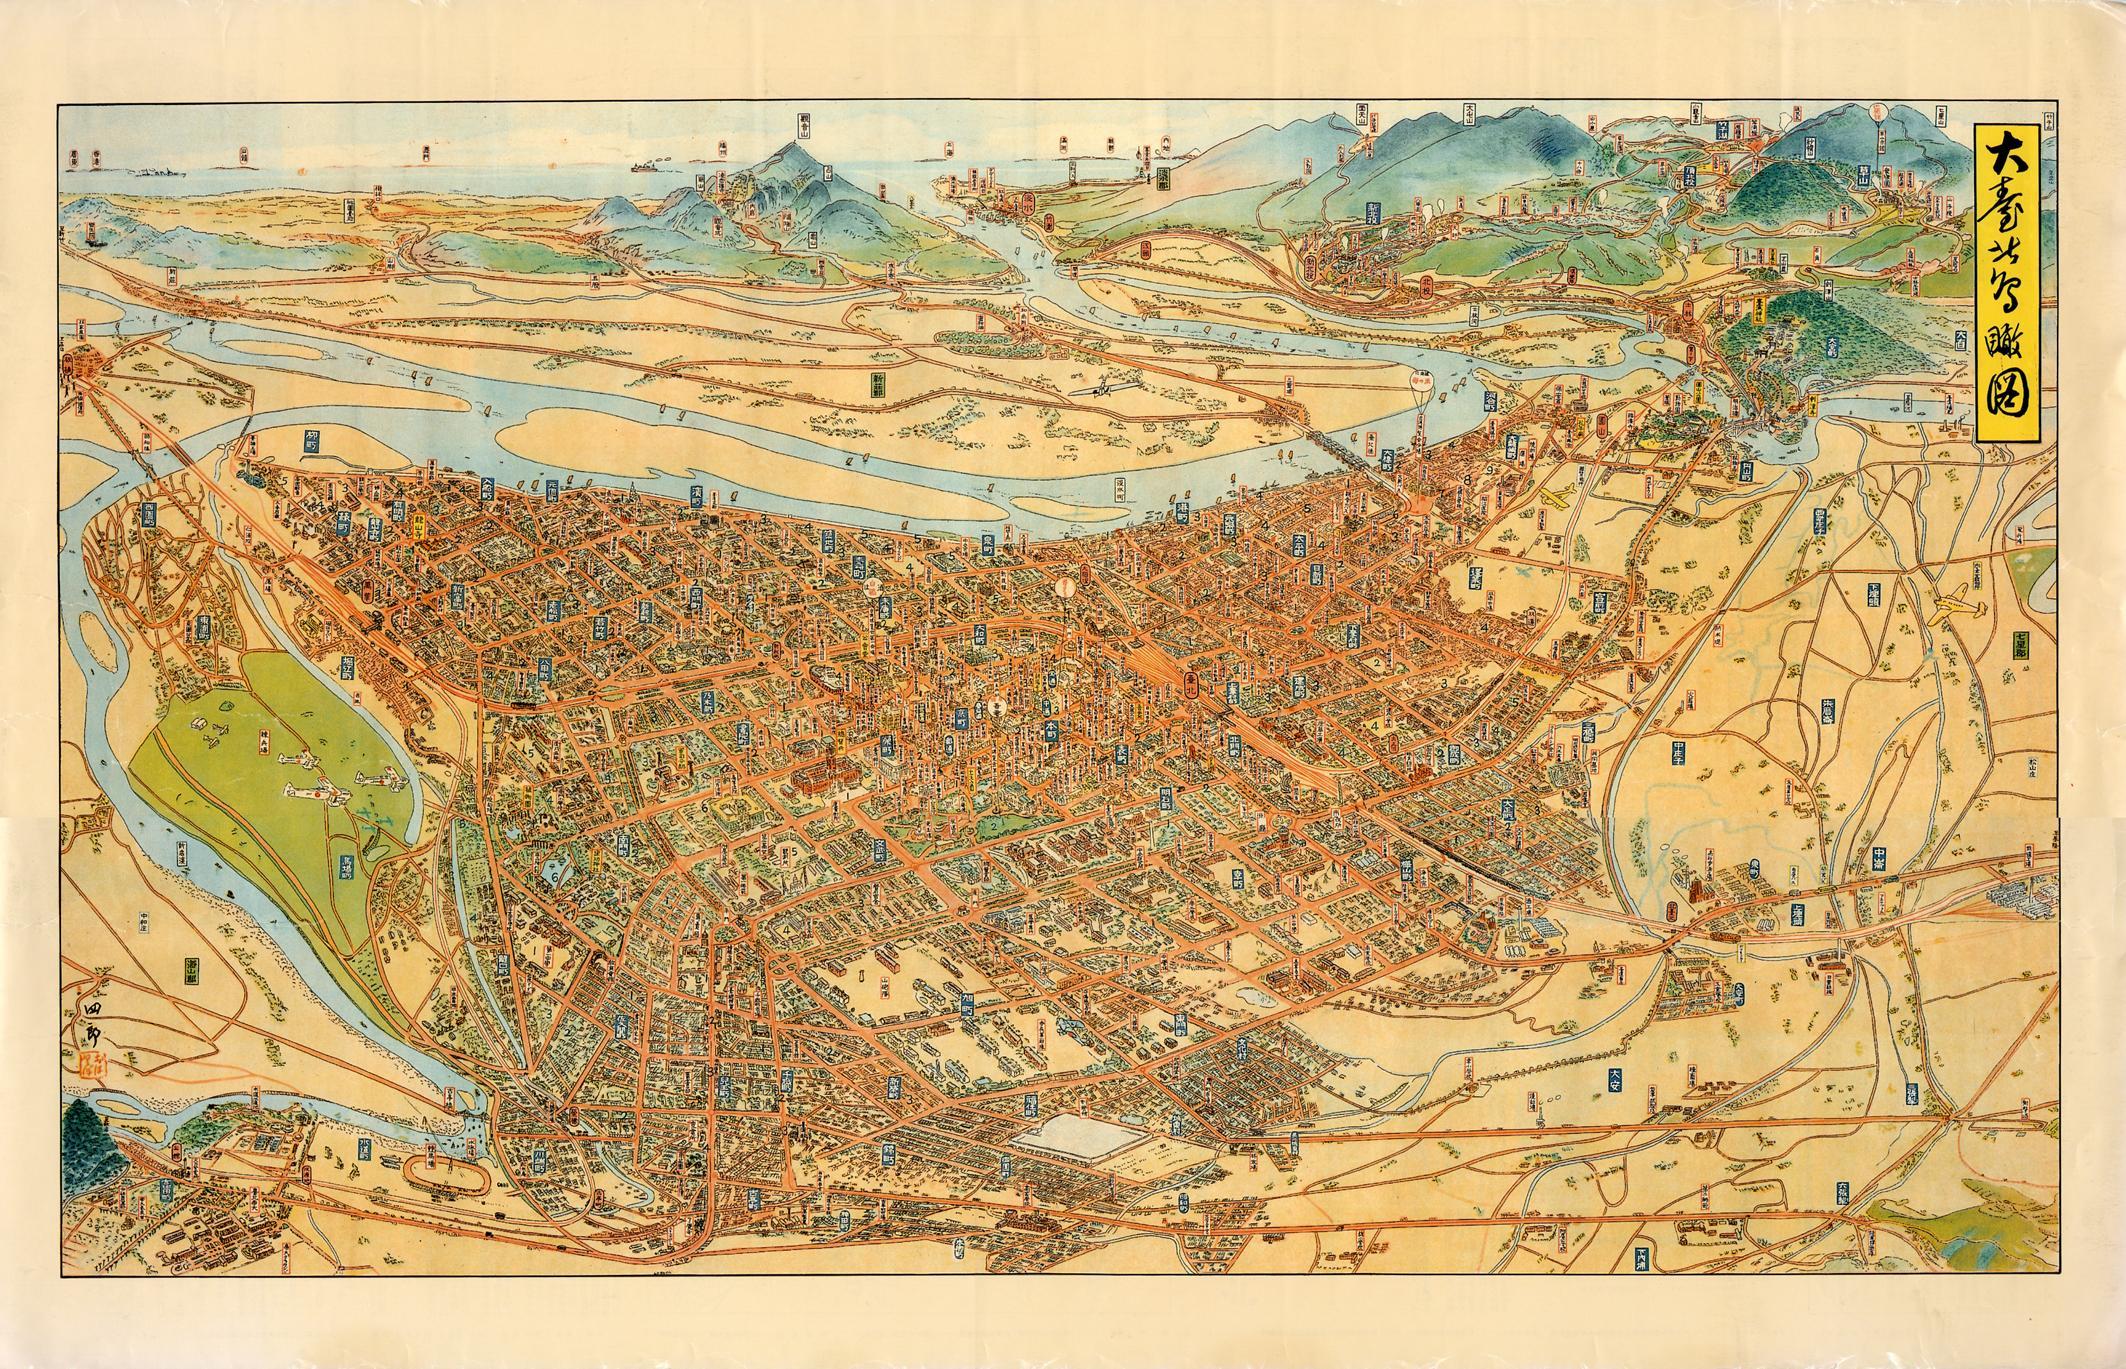 Bird's eye view of Greater Taipei 1935